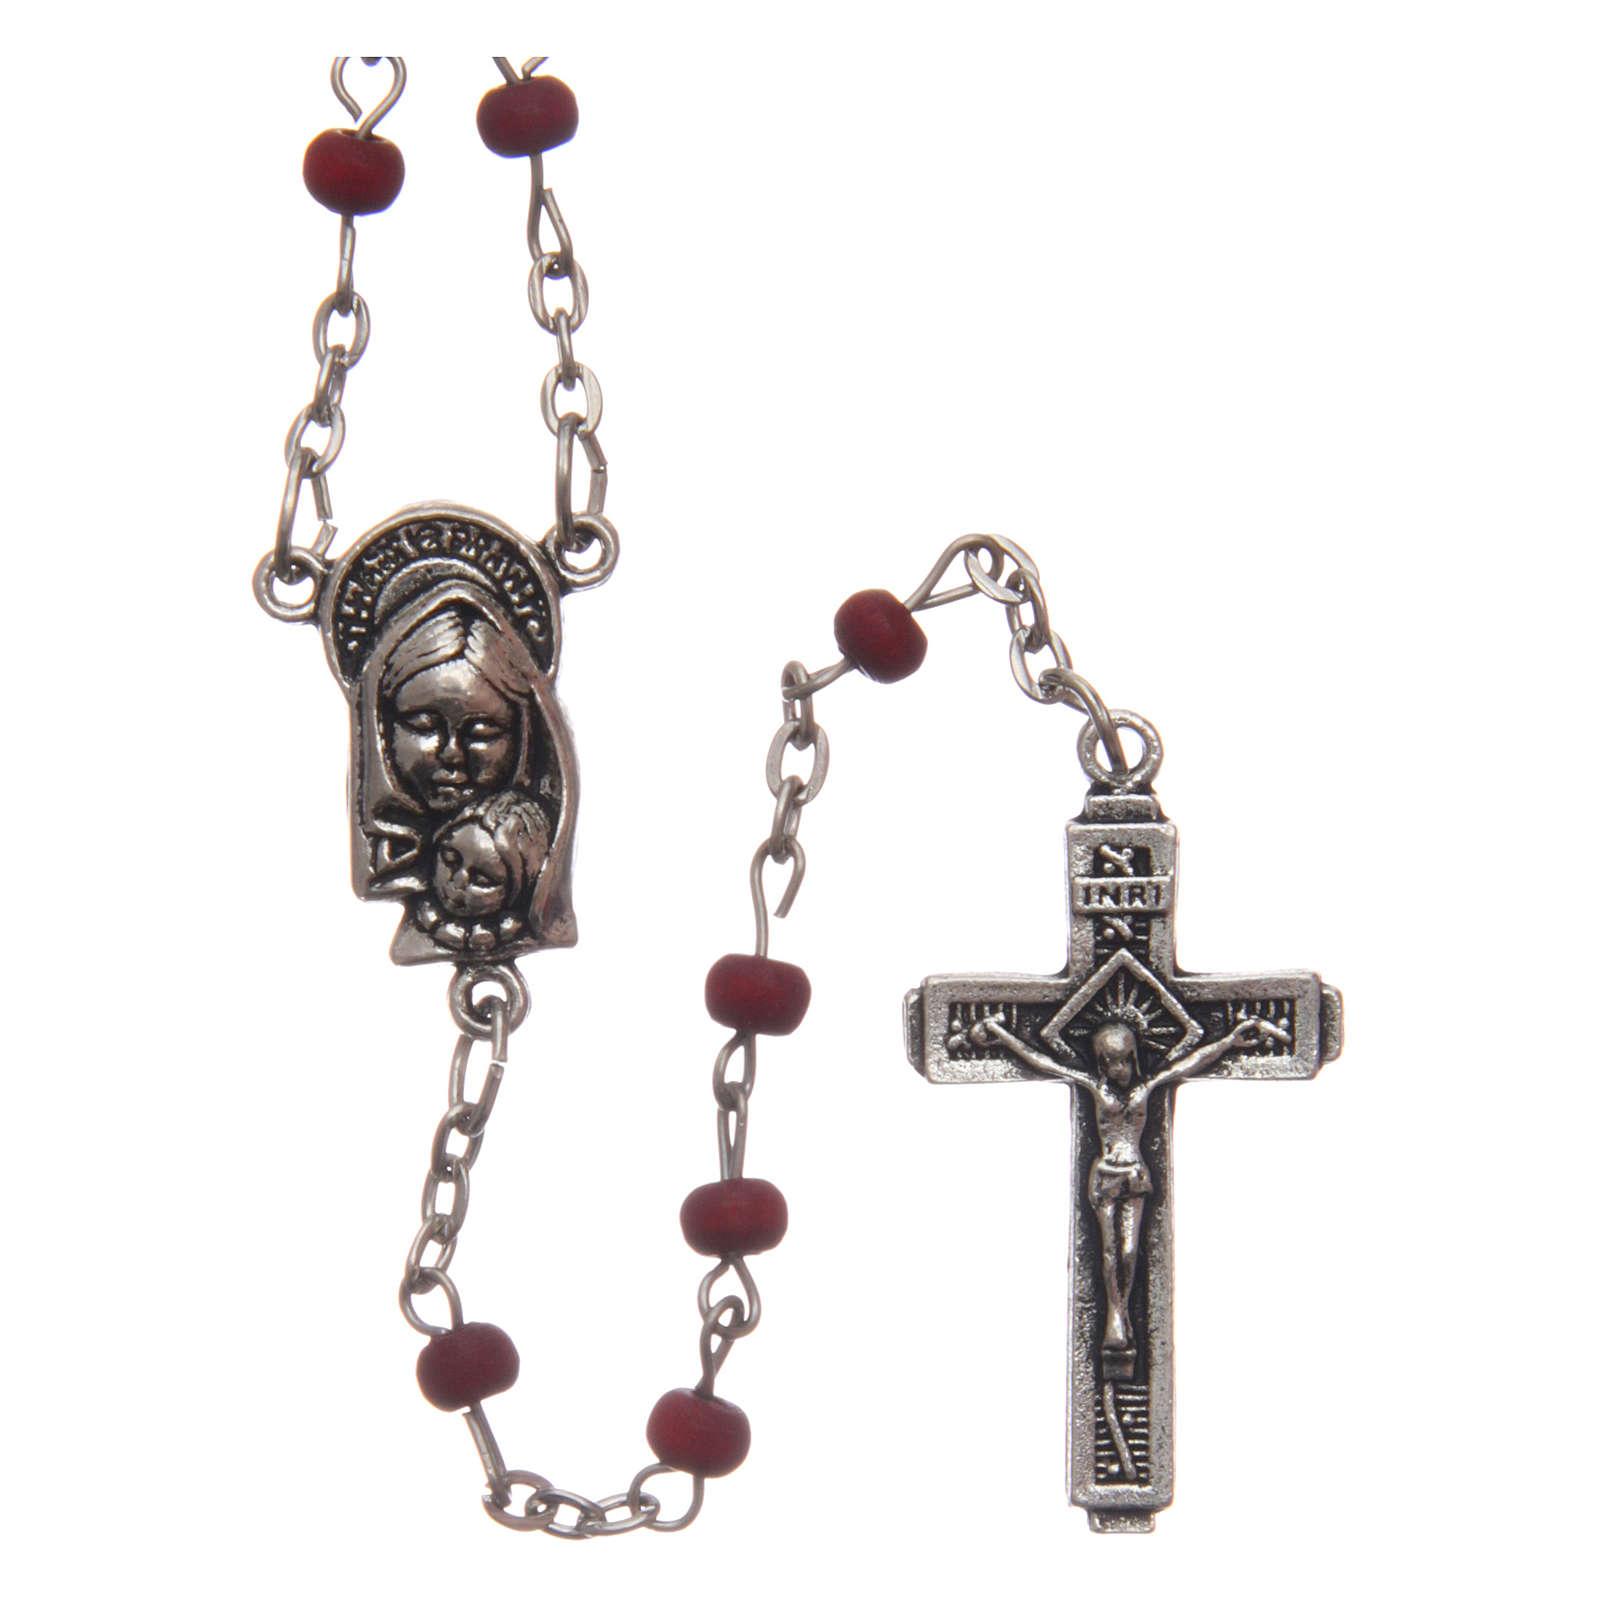 Wooden rose petal rosary 4 mm 4